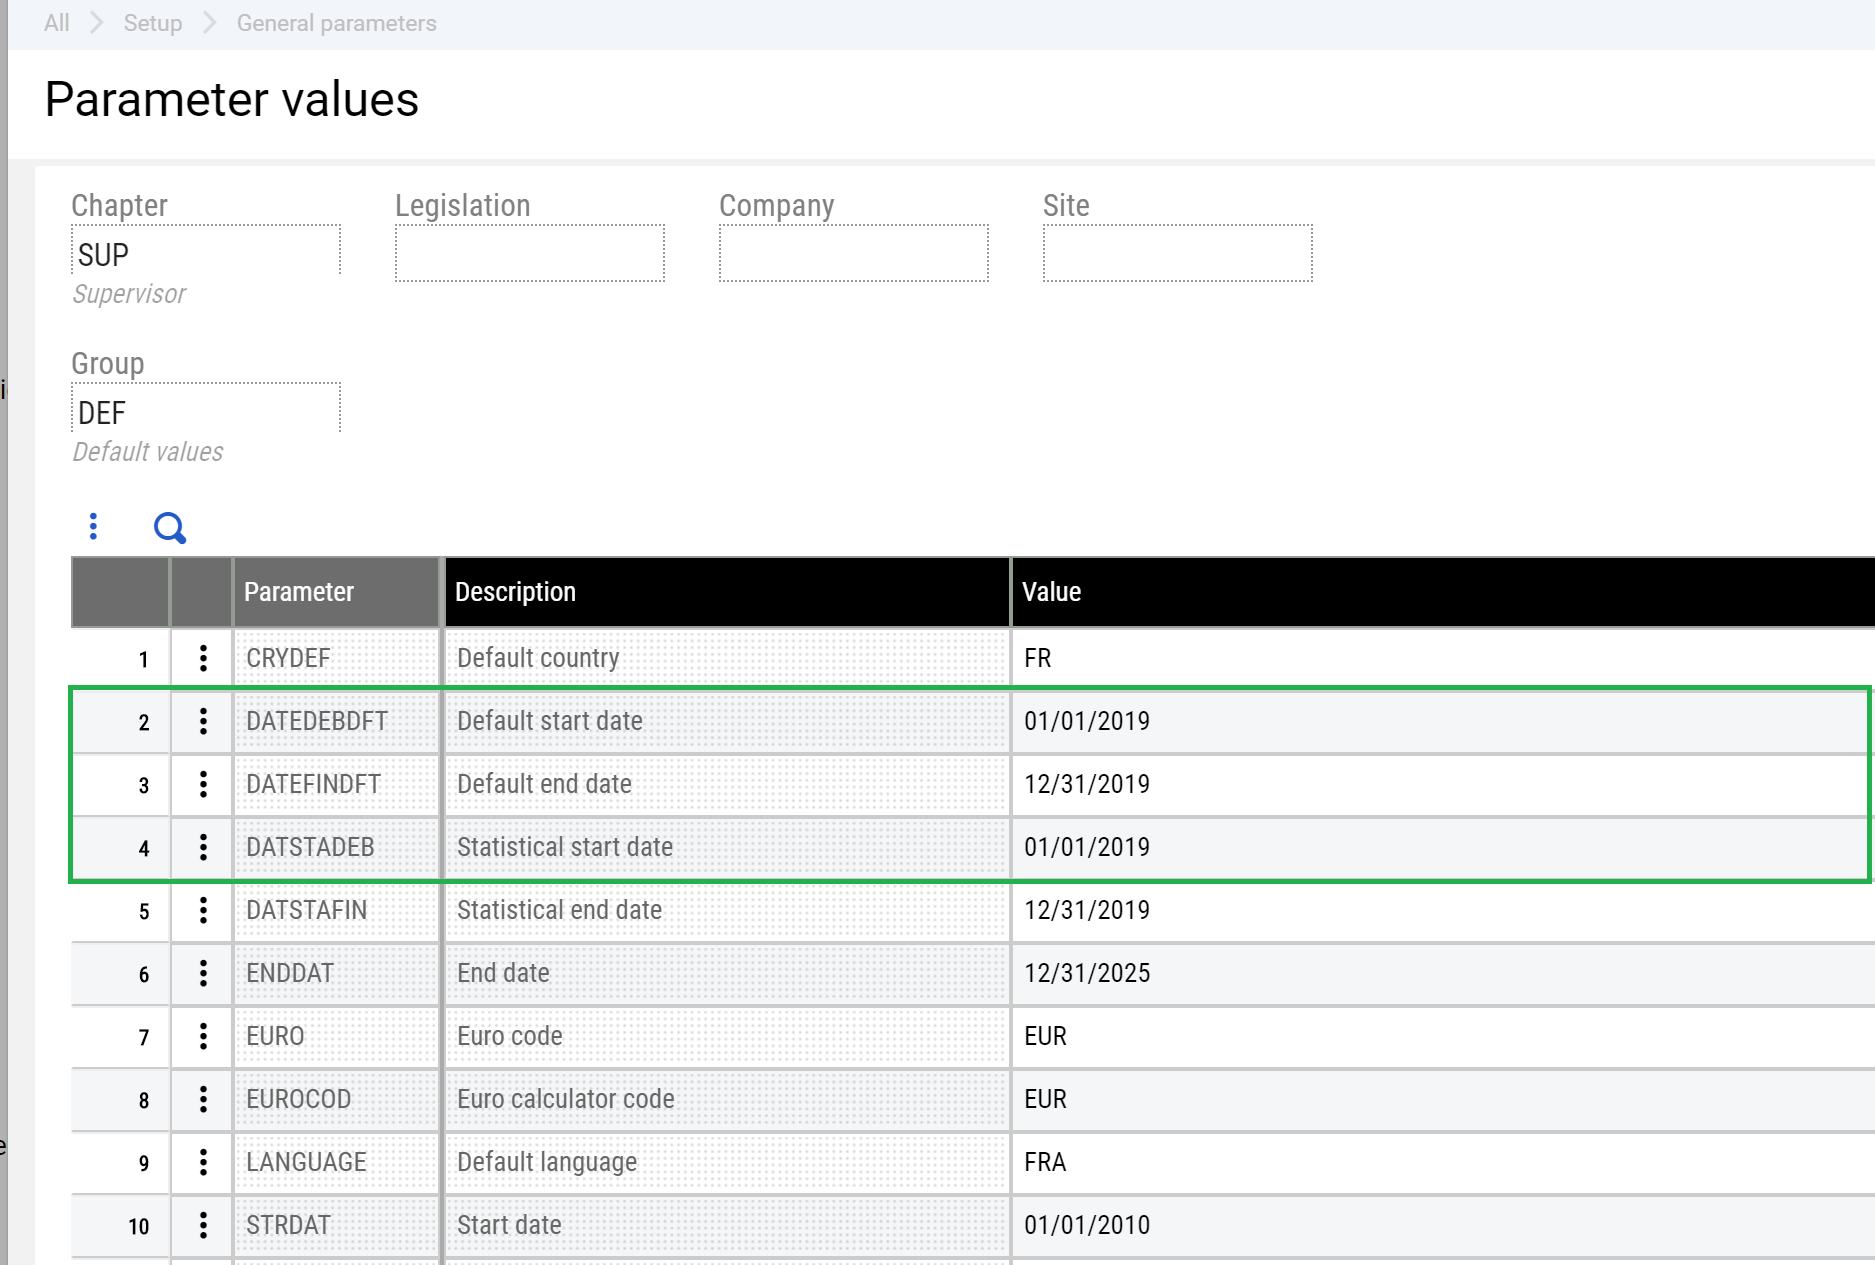 Parameter values